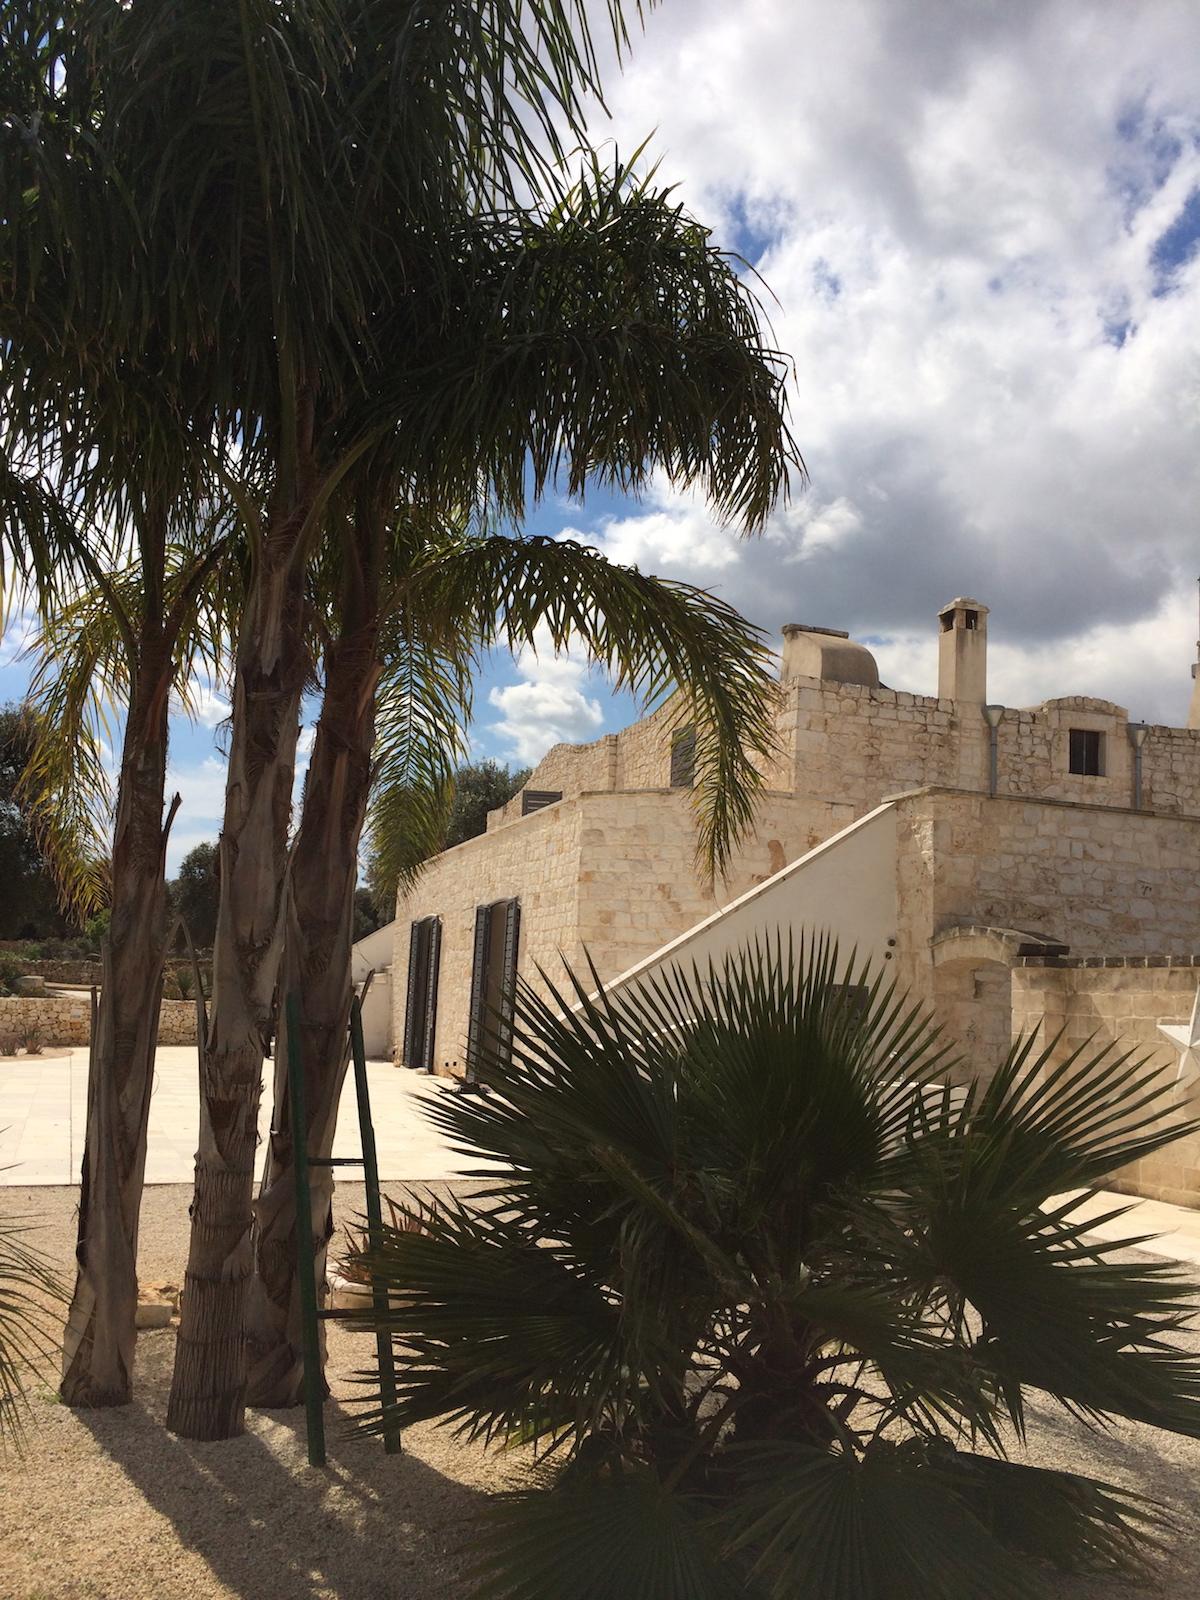 Villa and palm tree